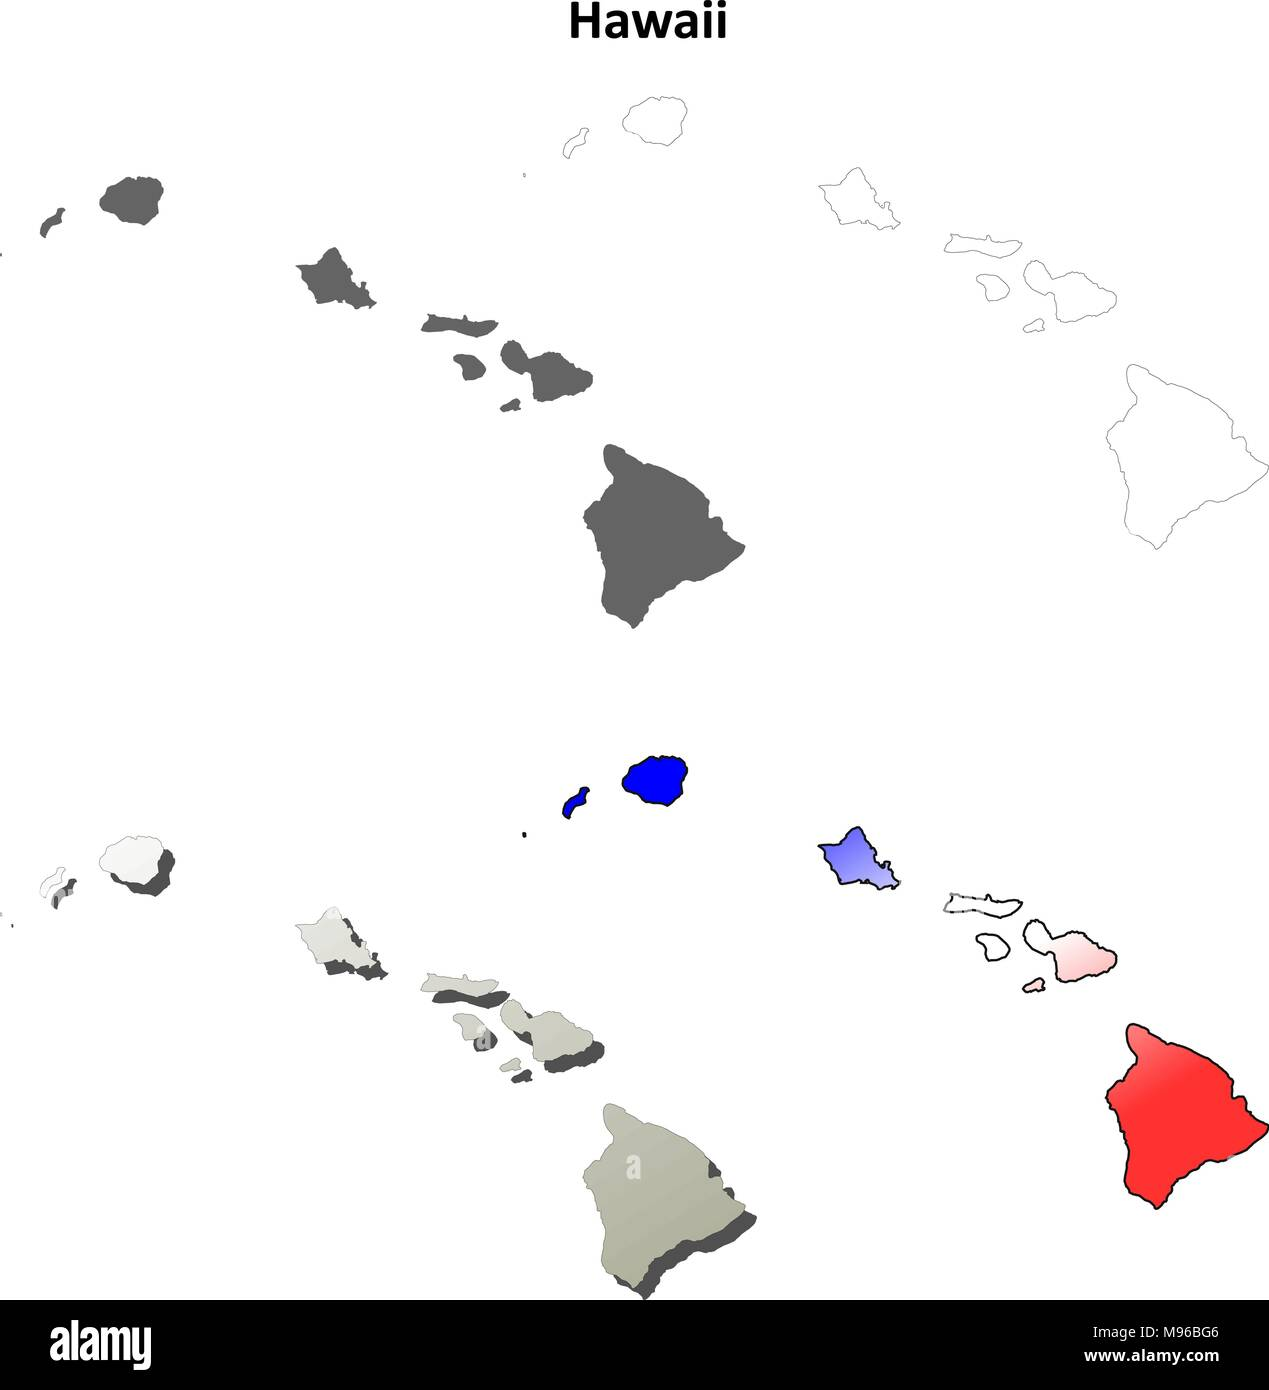 Hawaii Outline Map Set Stock Vector Art Illustration Vector Image